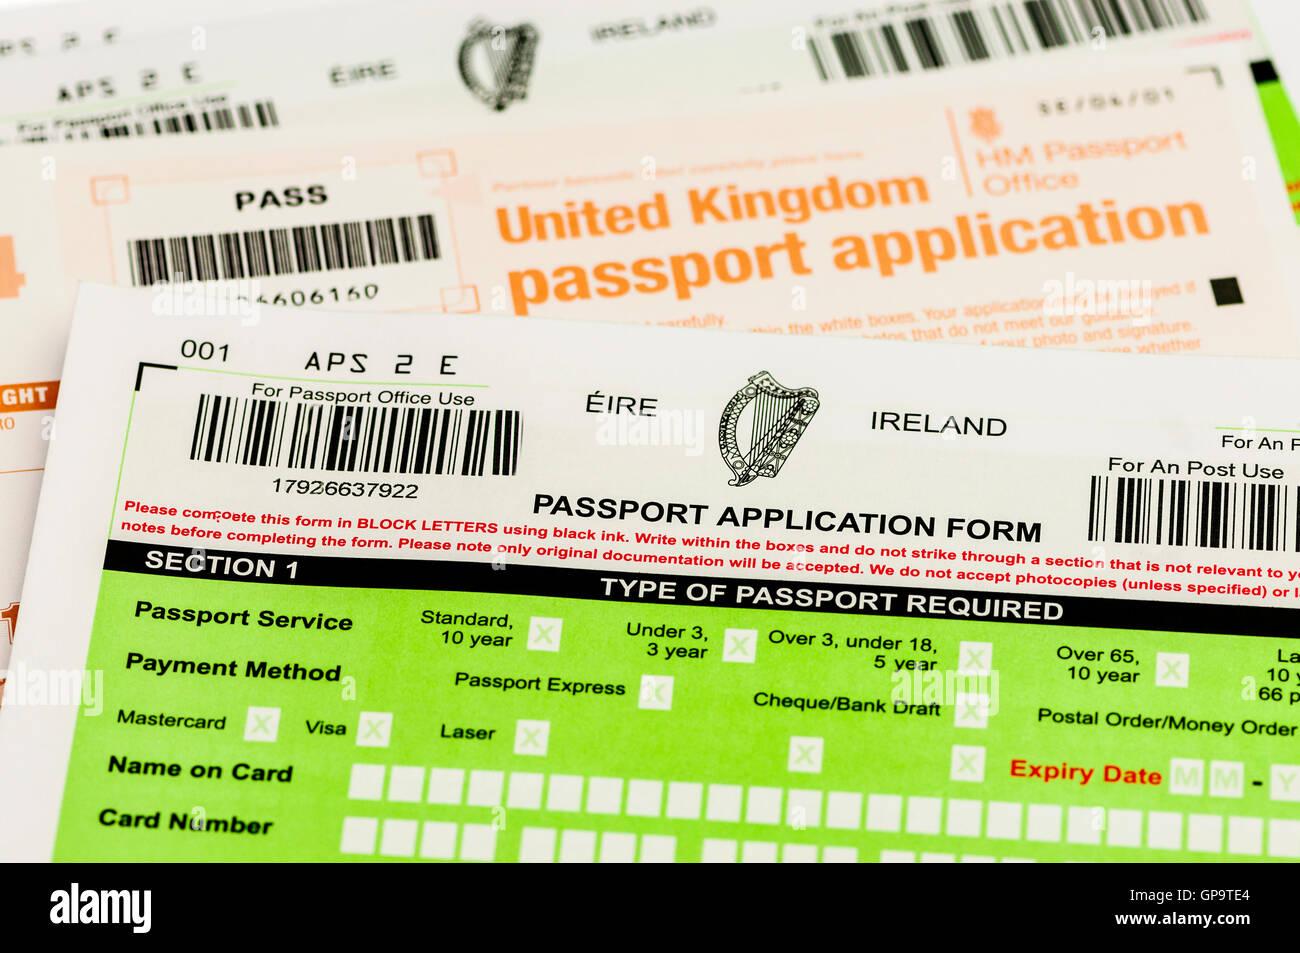 passport application form uk login